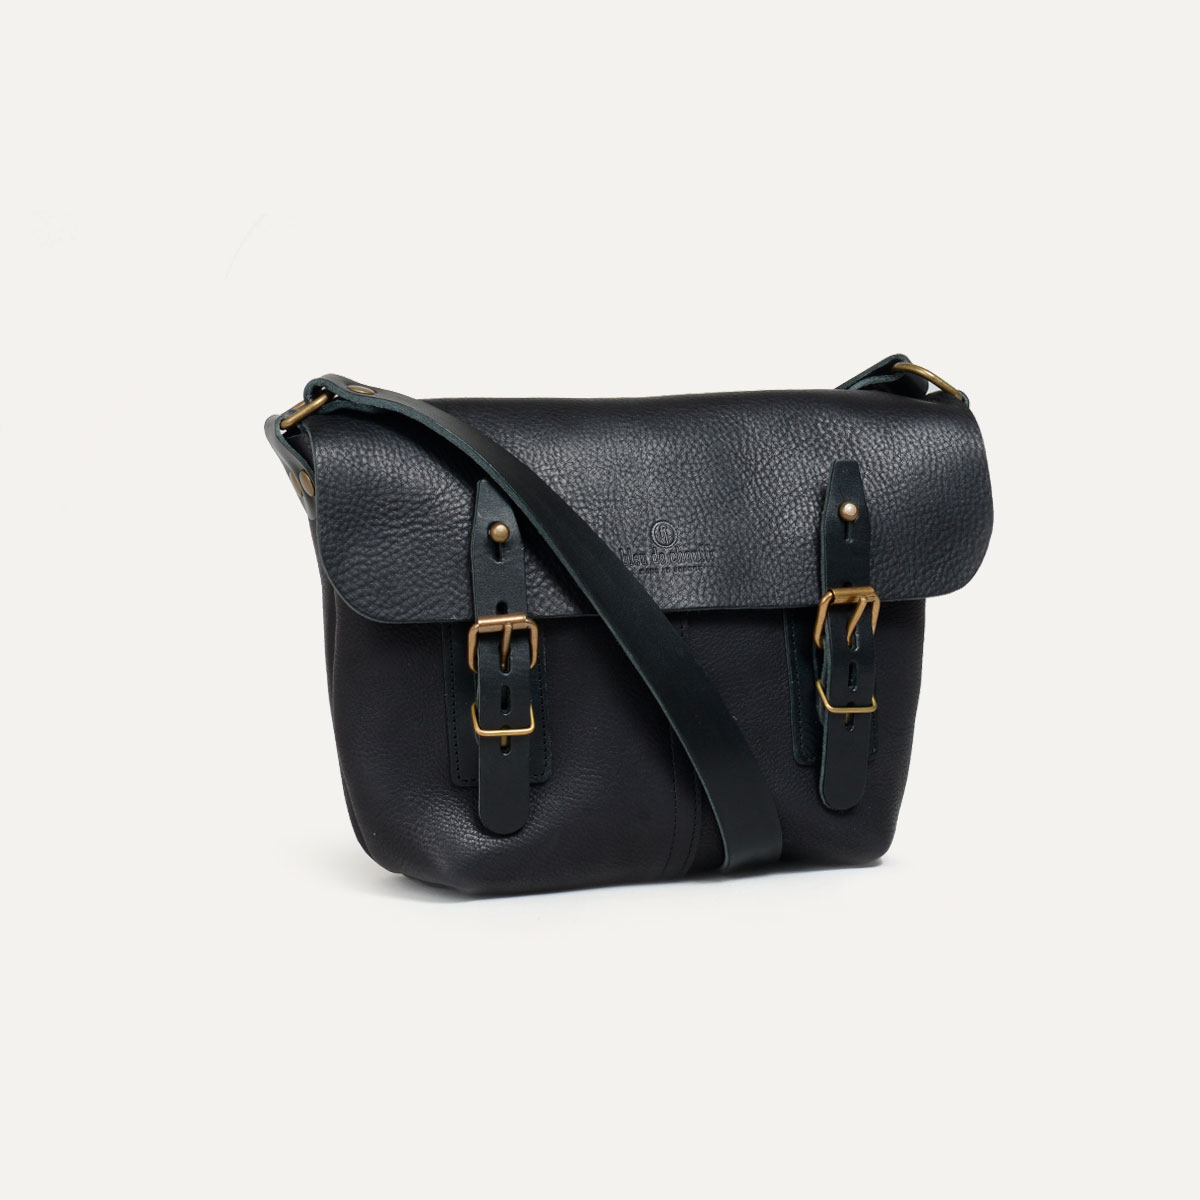 sac besace en cuir louis fabriqu en france bleu de. Black Bedroom Furniture Sets. Home Design Ideas